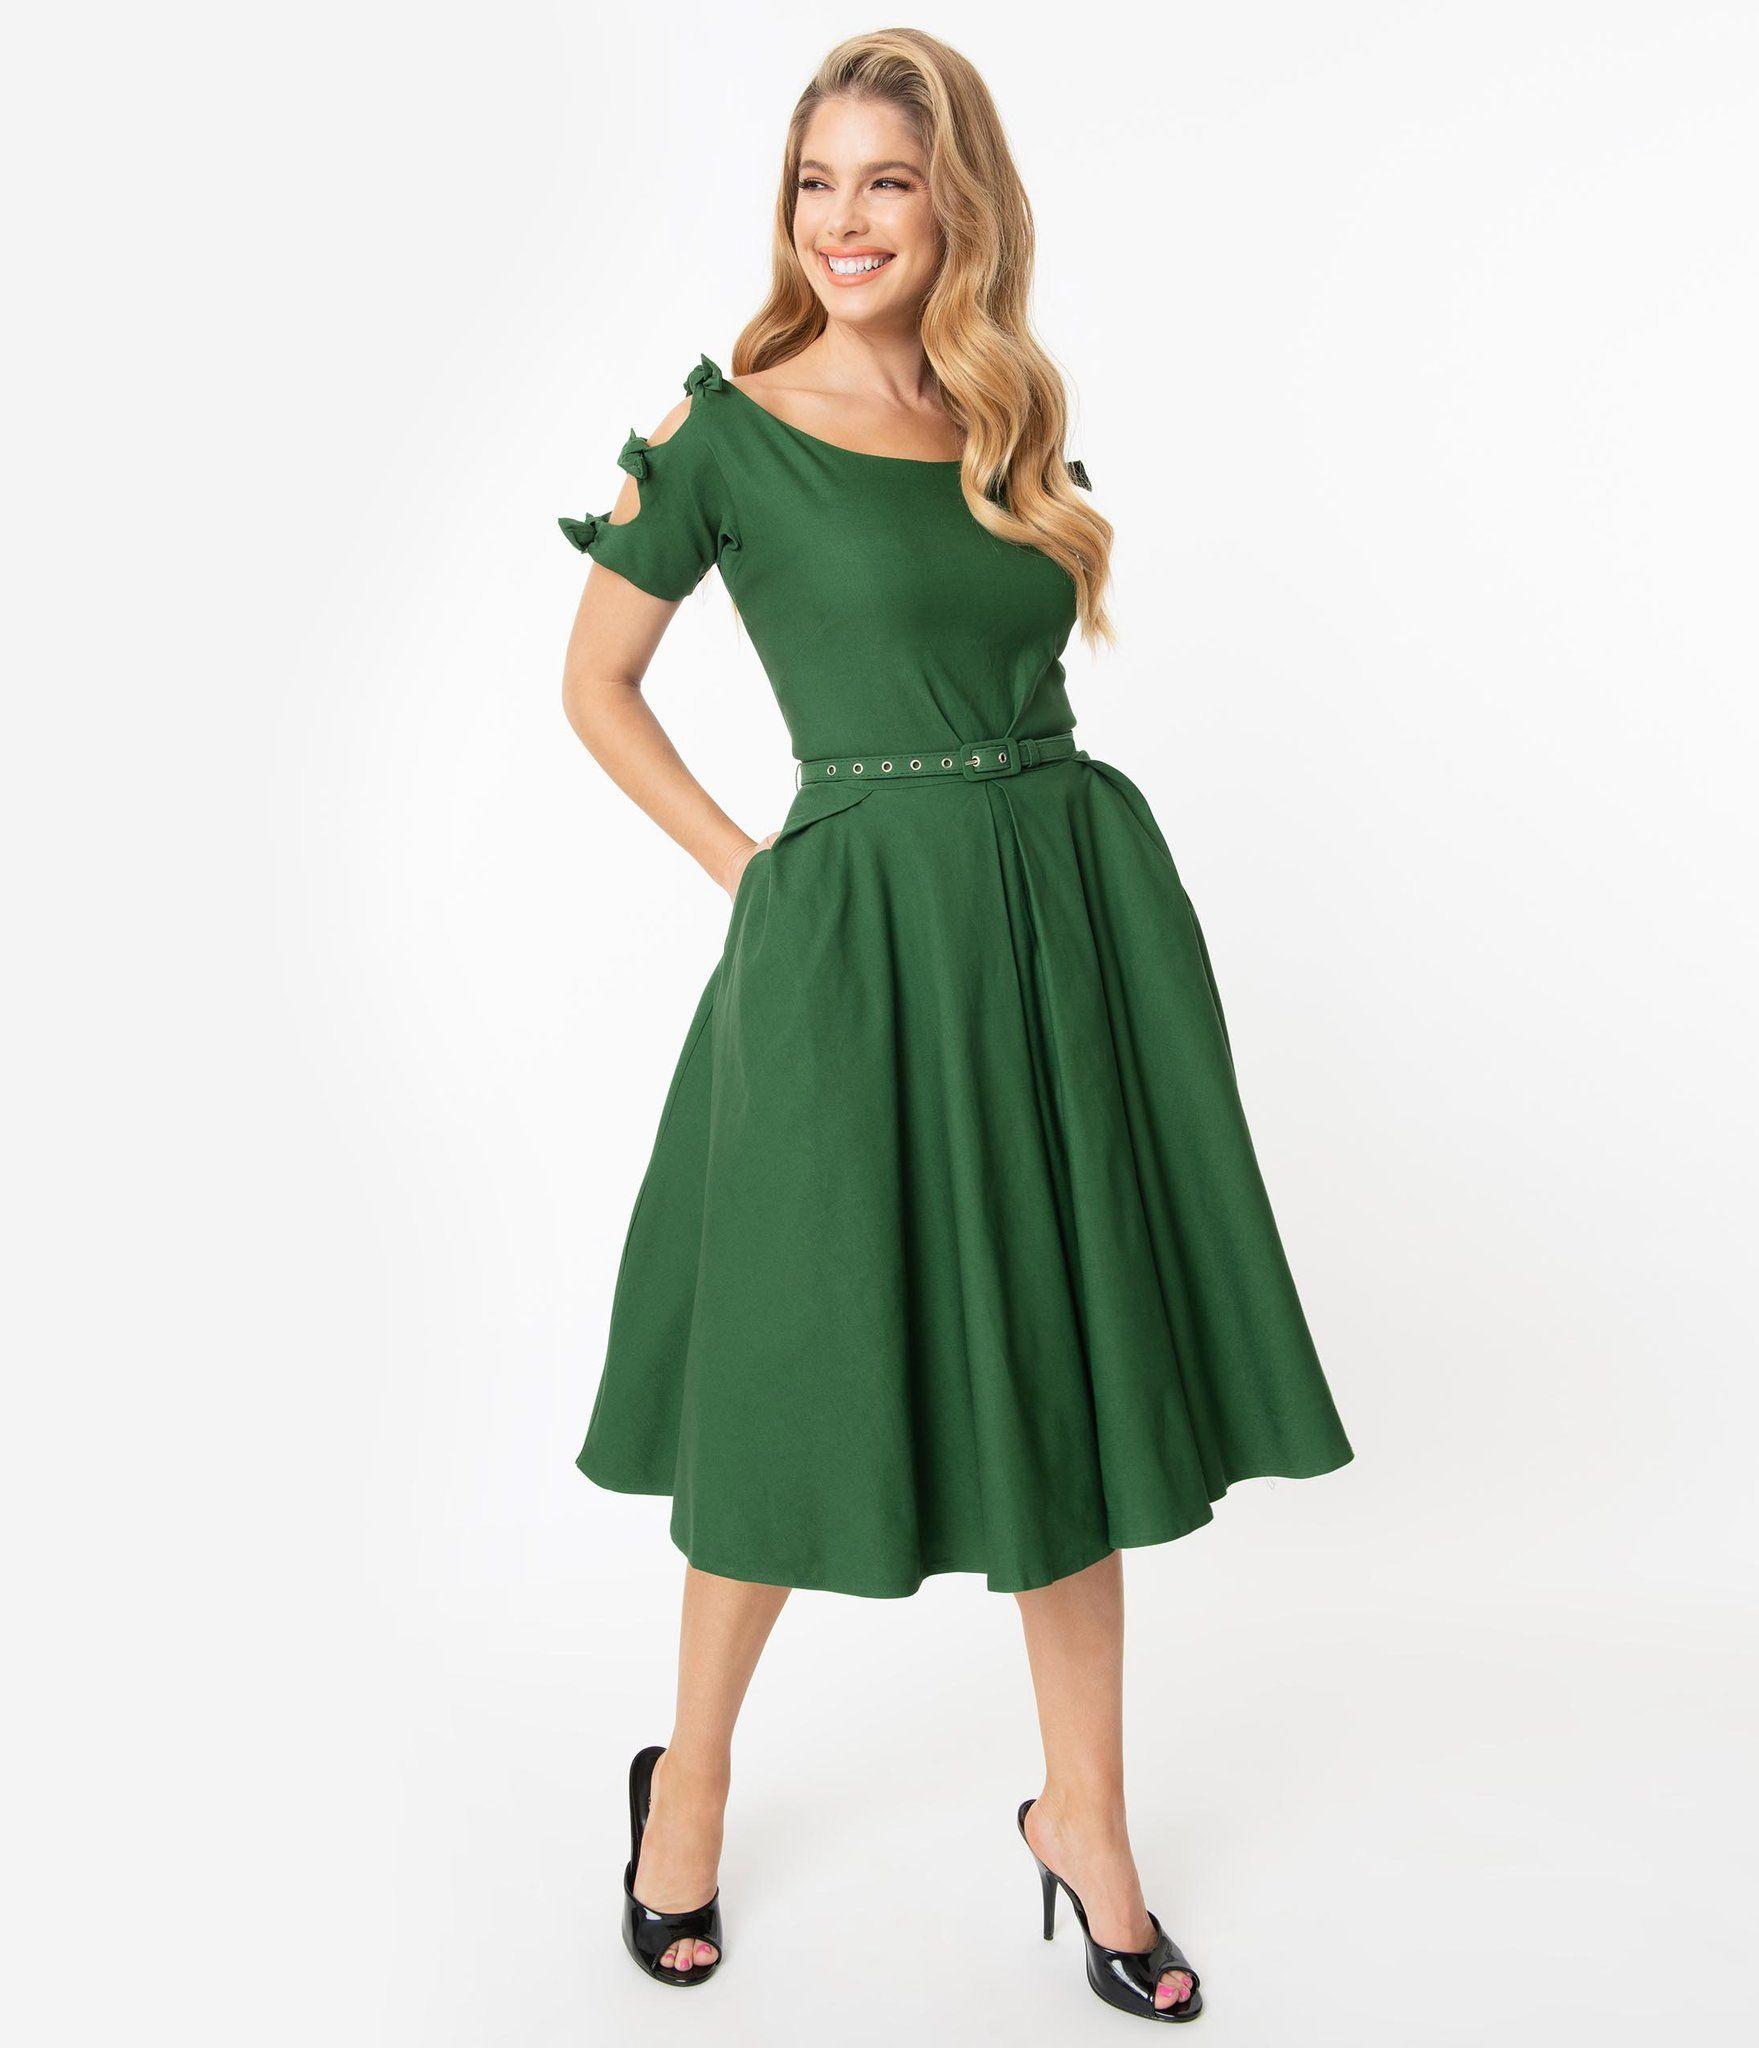 Unique Vintage 1950s Green Selma Swing Dress Mod And Retro Clothing Unique Dresses Swing Dress Skirt Inspiration [ 2048 x 1759 Pixel ]